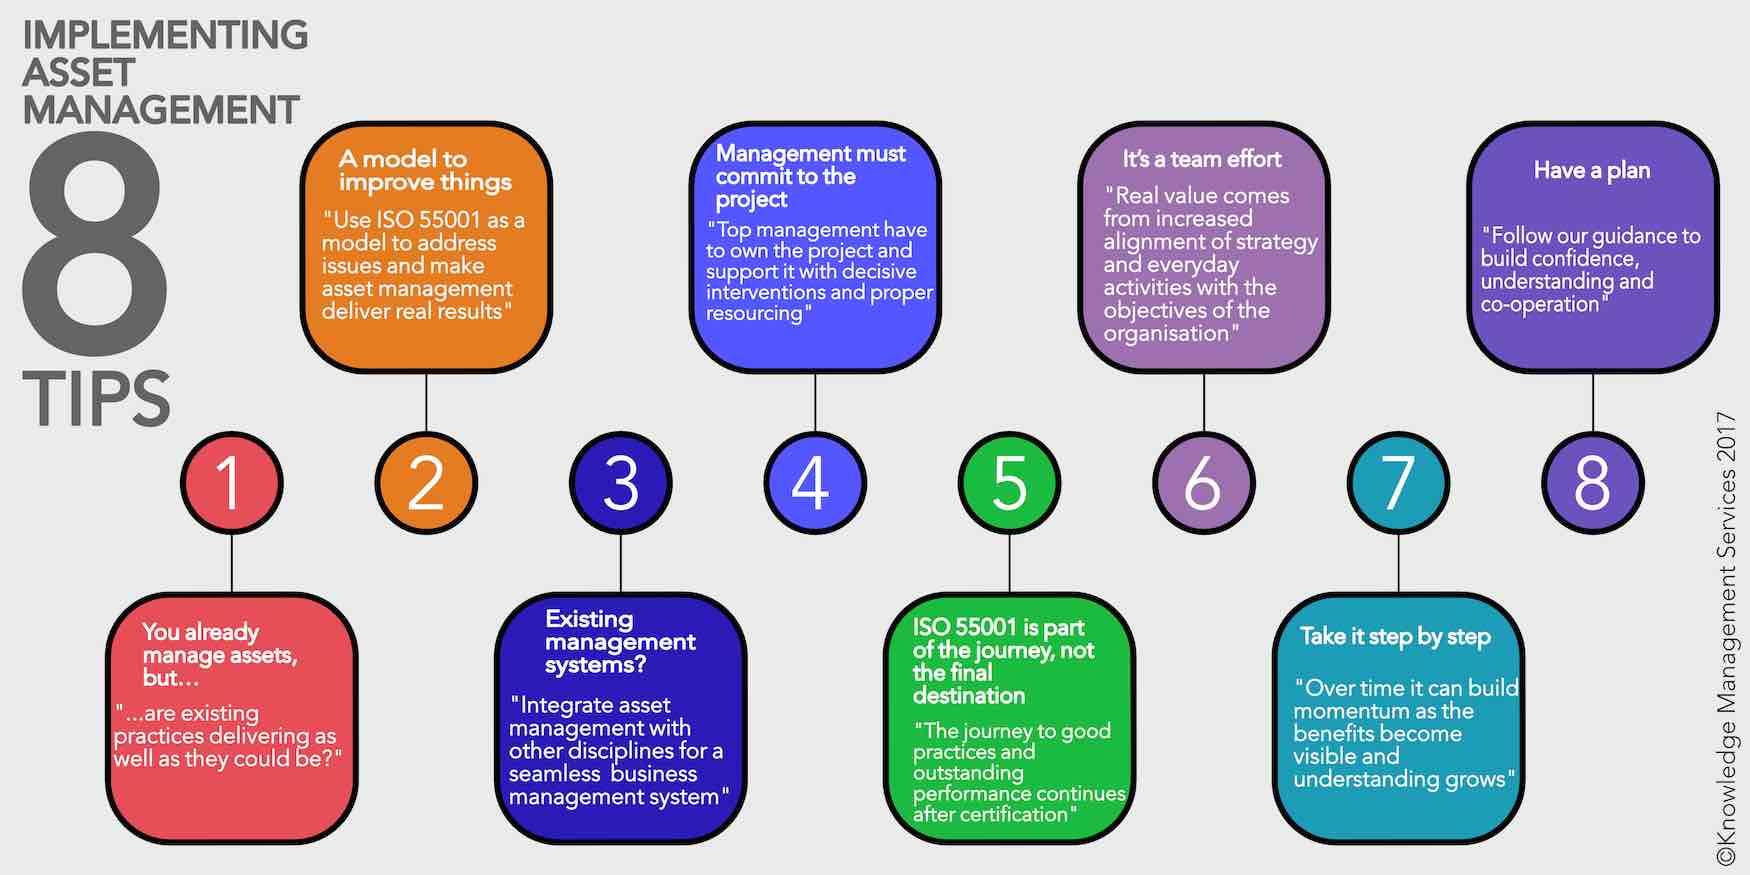 8 tips for implementing asset management - KMS Asset Management